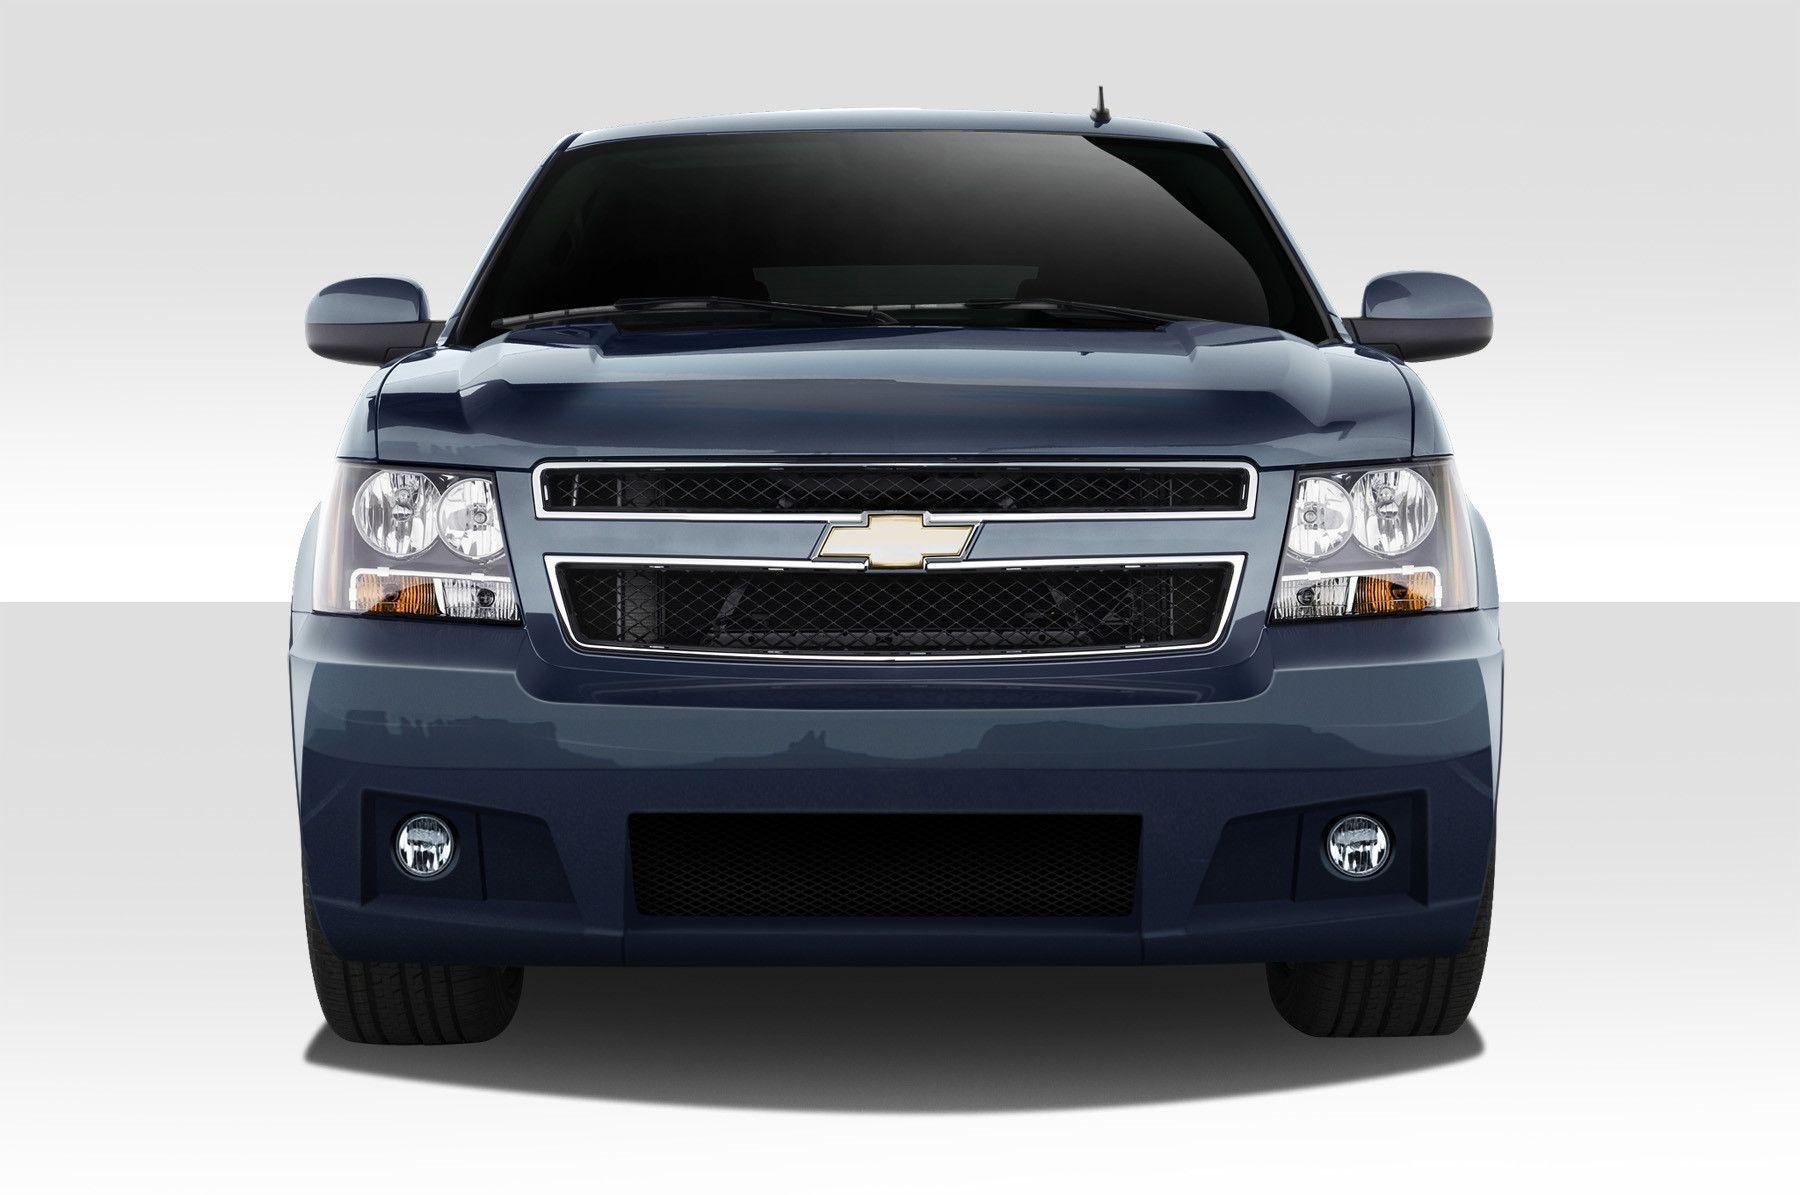 2007-2014 Chevrolet Tahoe Suburban Duraflex BT-1 Front Bumper Cover - 1  Piece